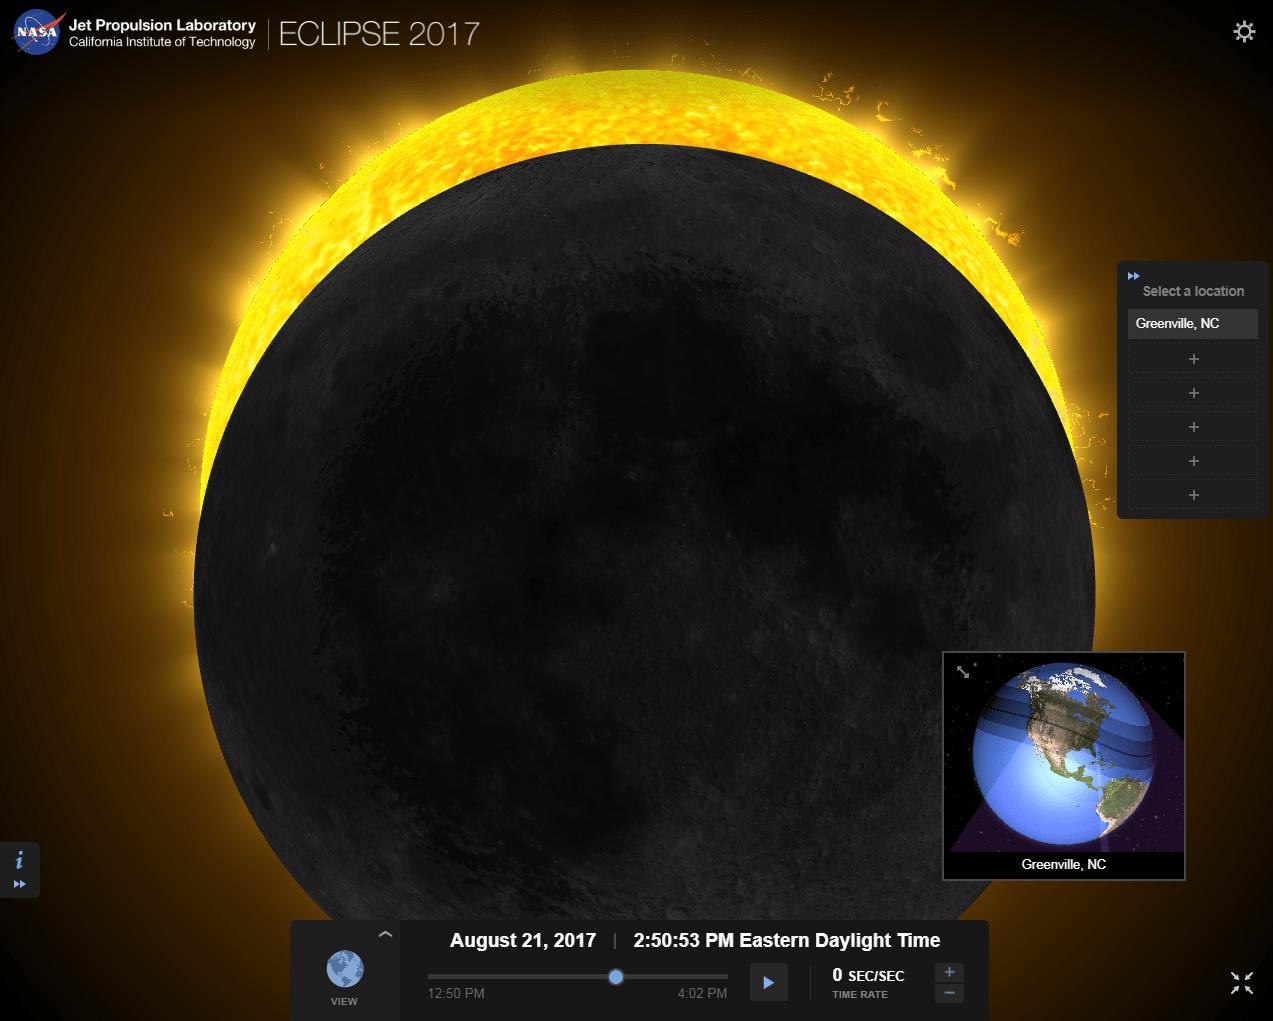 greenville_eclipse_1_443492